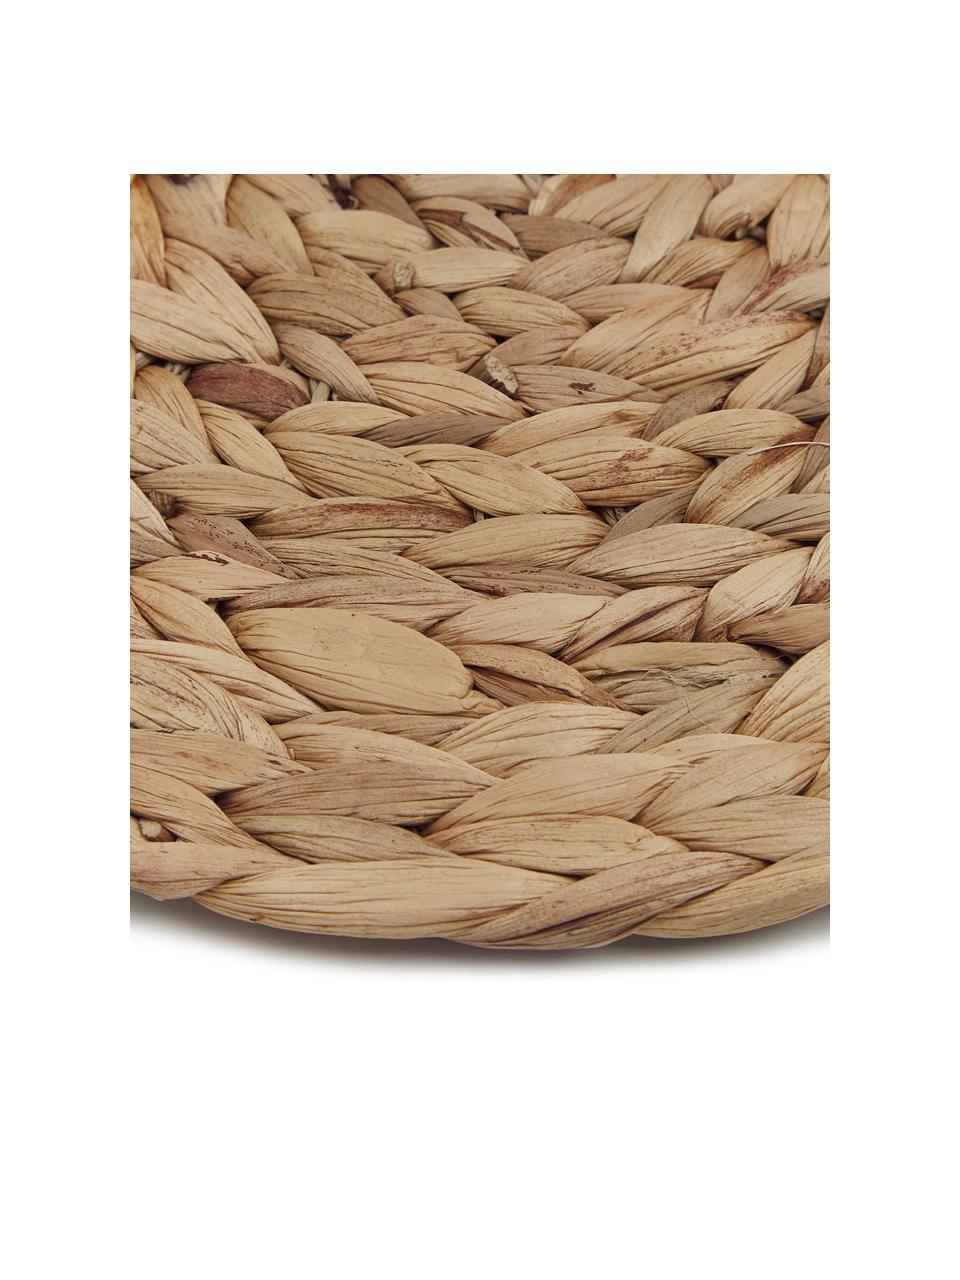 Ronde placemats Wanda, 4 stuks, Waterhyacint, Beige, Ø 35 cm